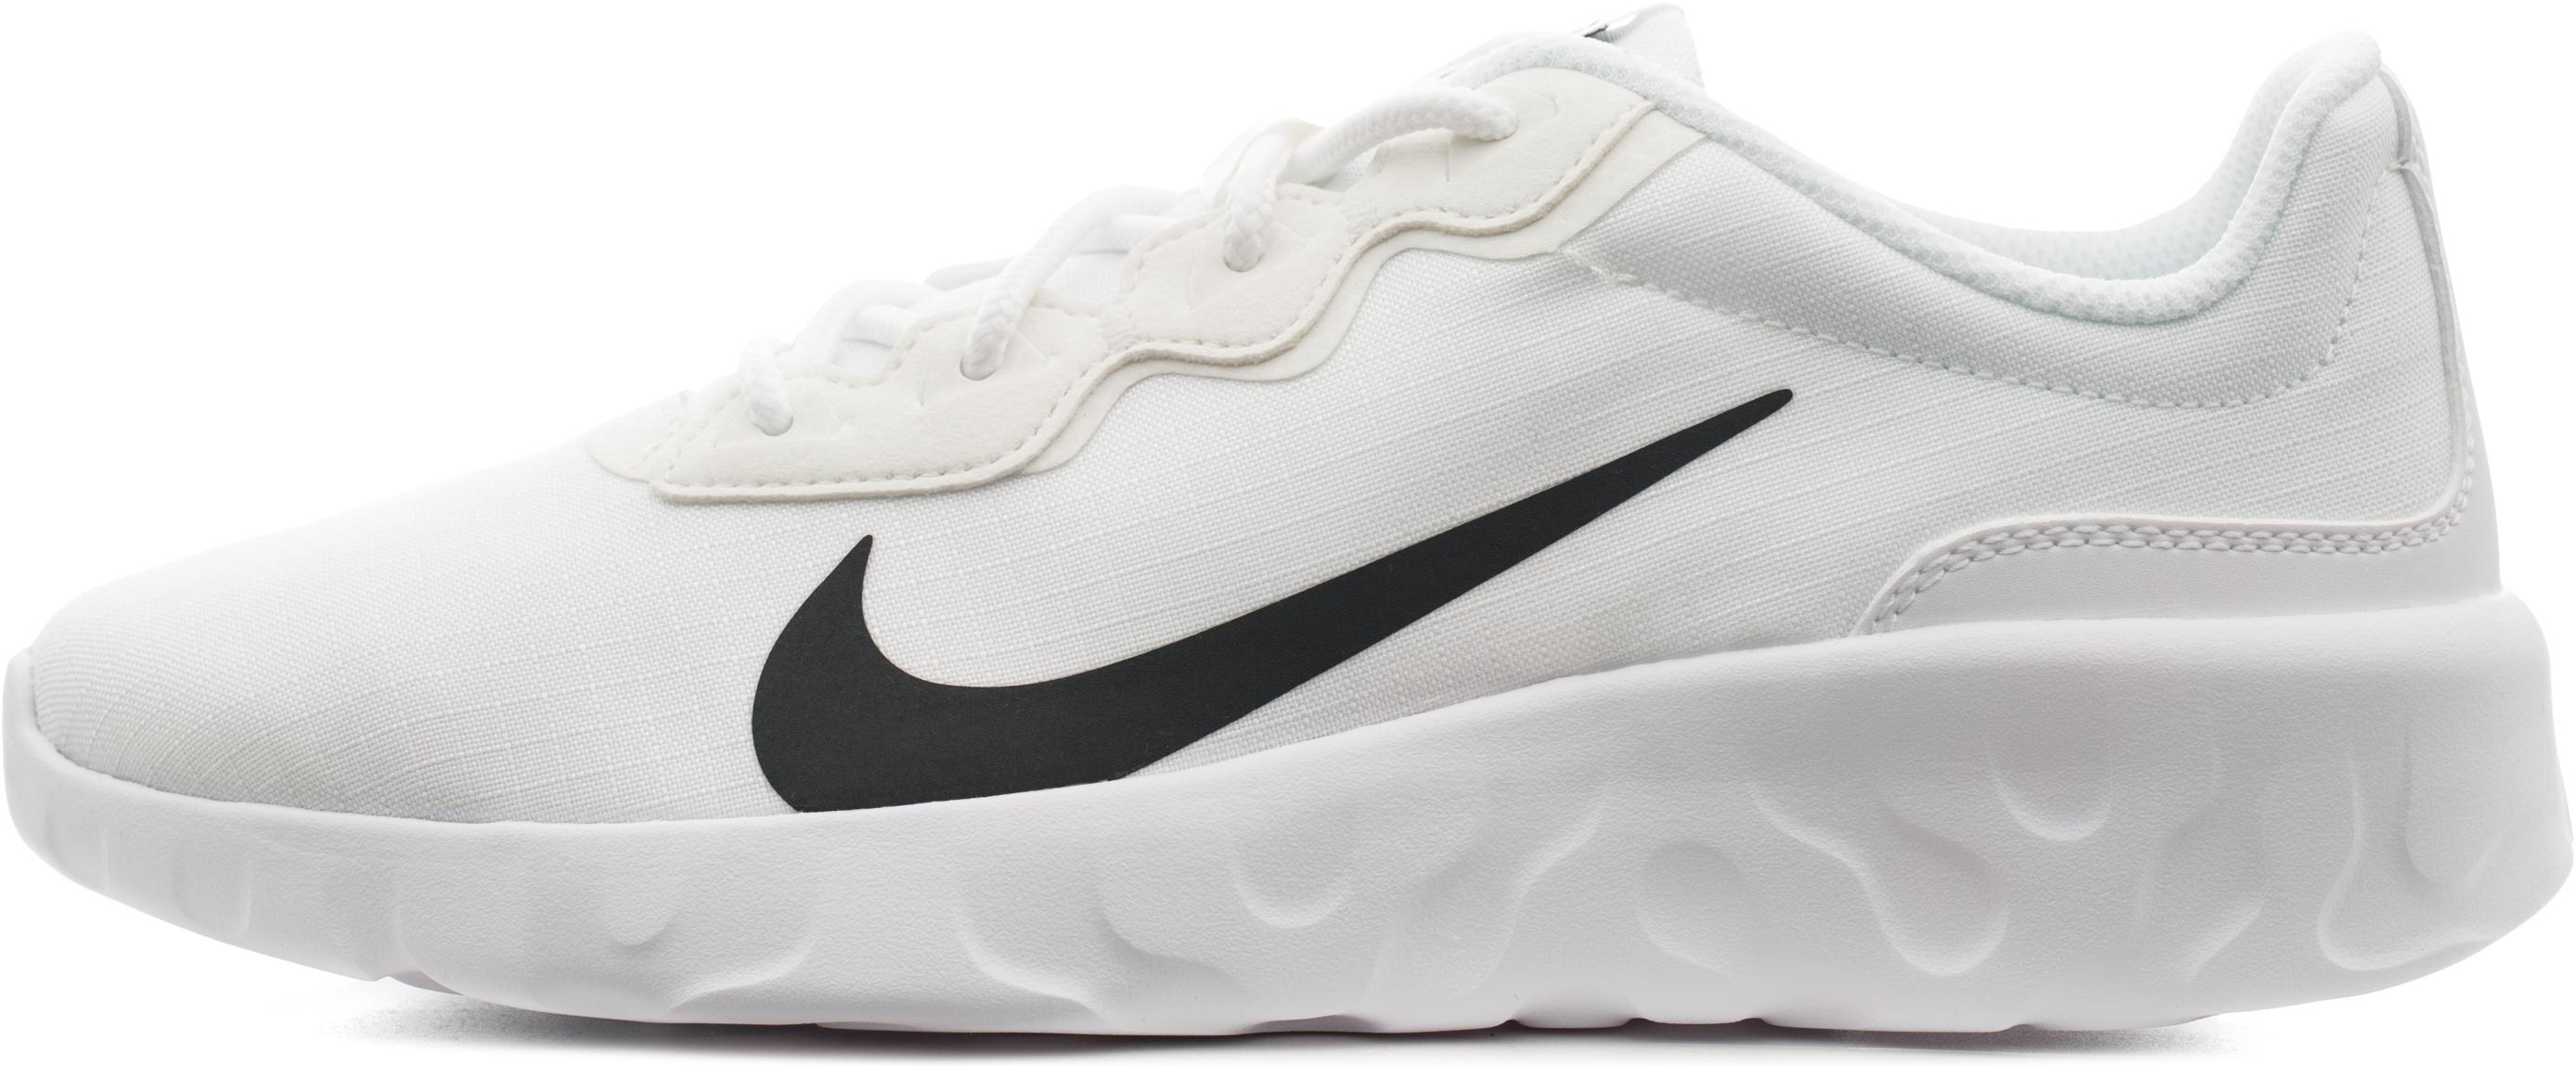 Nike Кроссовки женские Explore Strada, размер 39